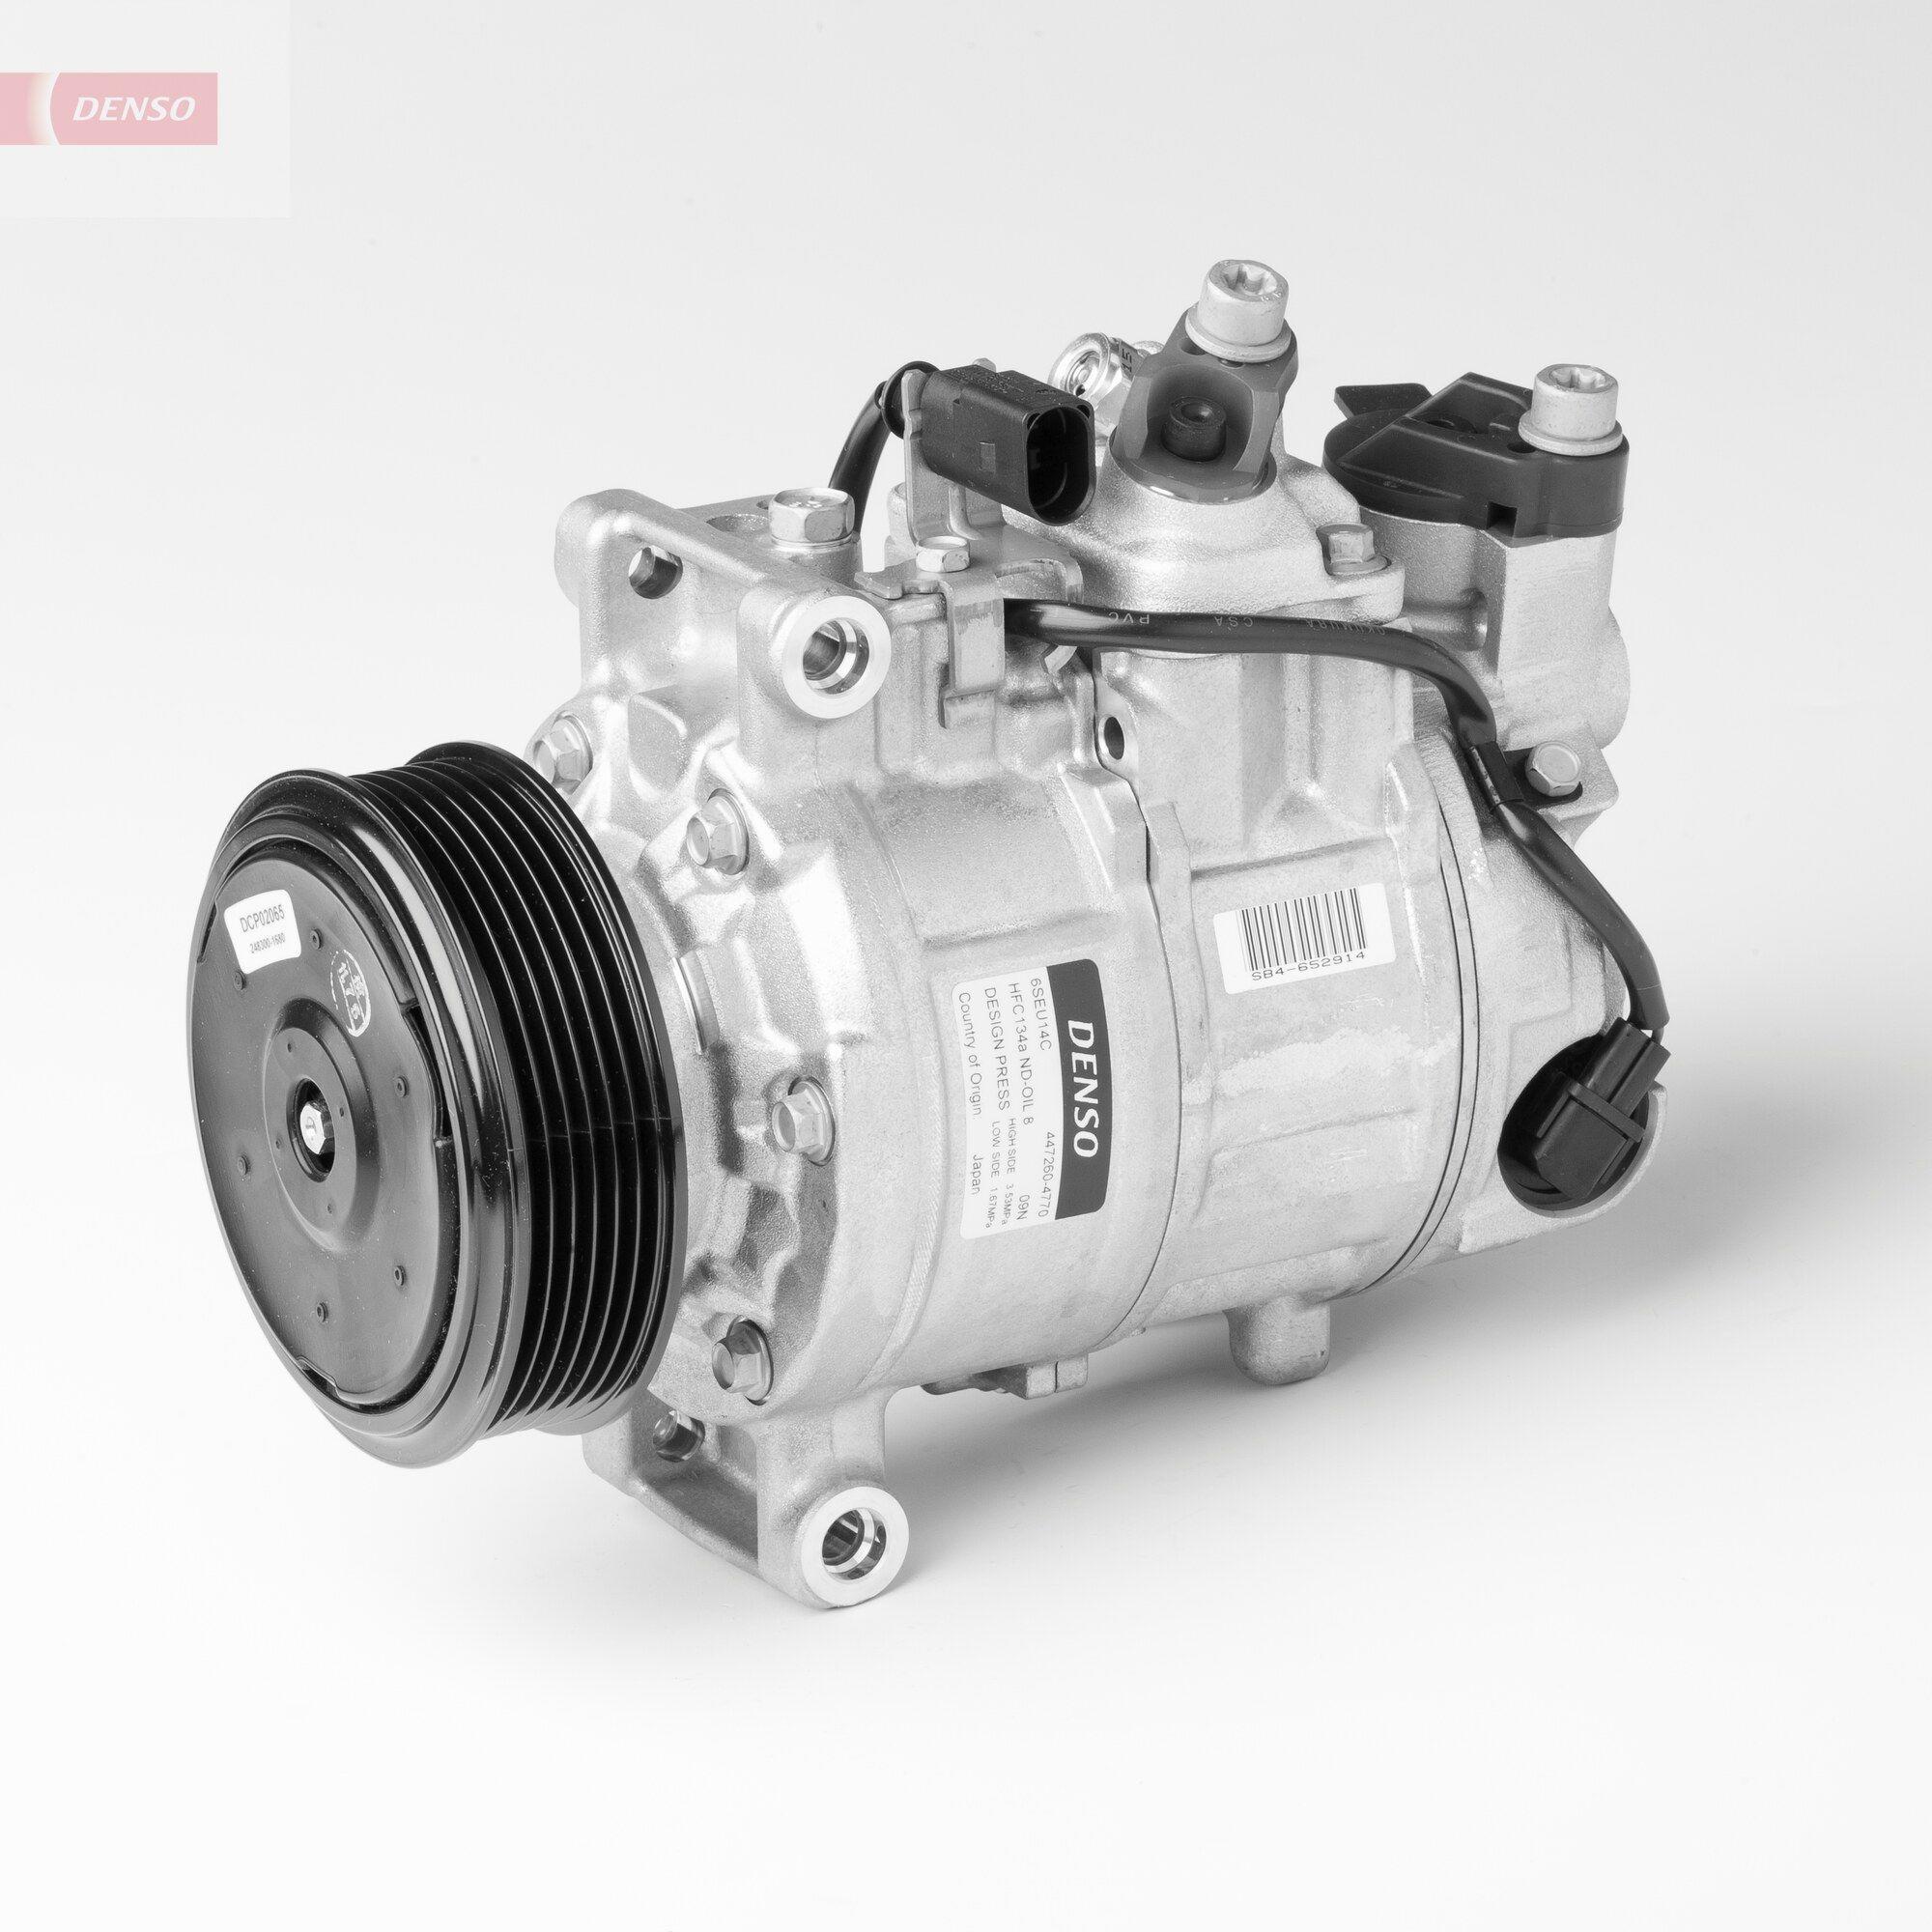 DENSO Klimakompressor DCP02065